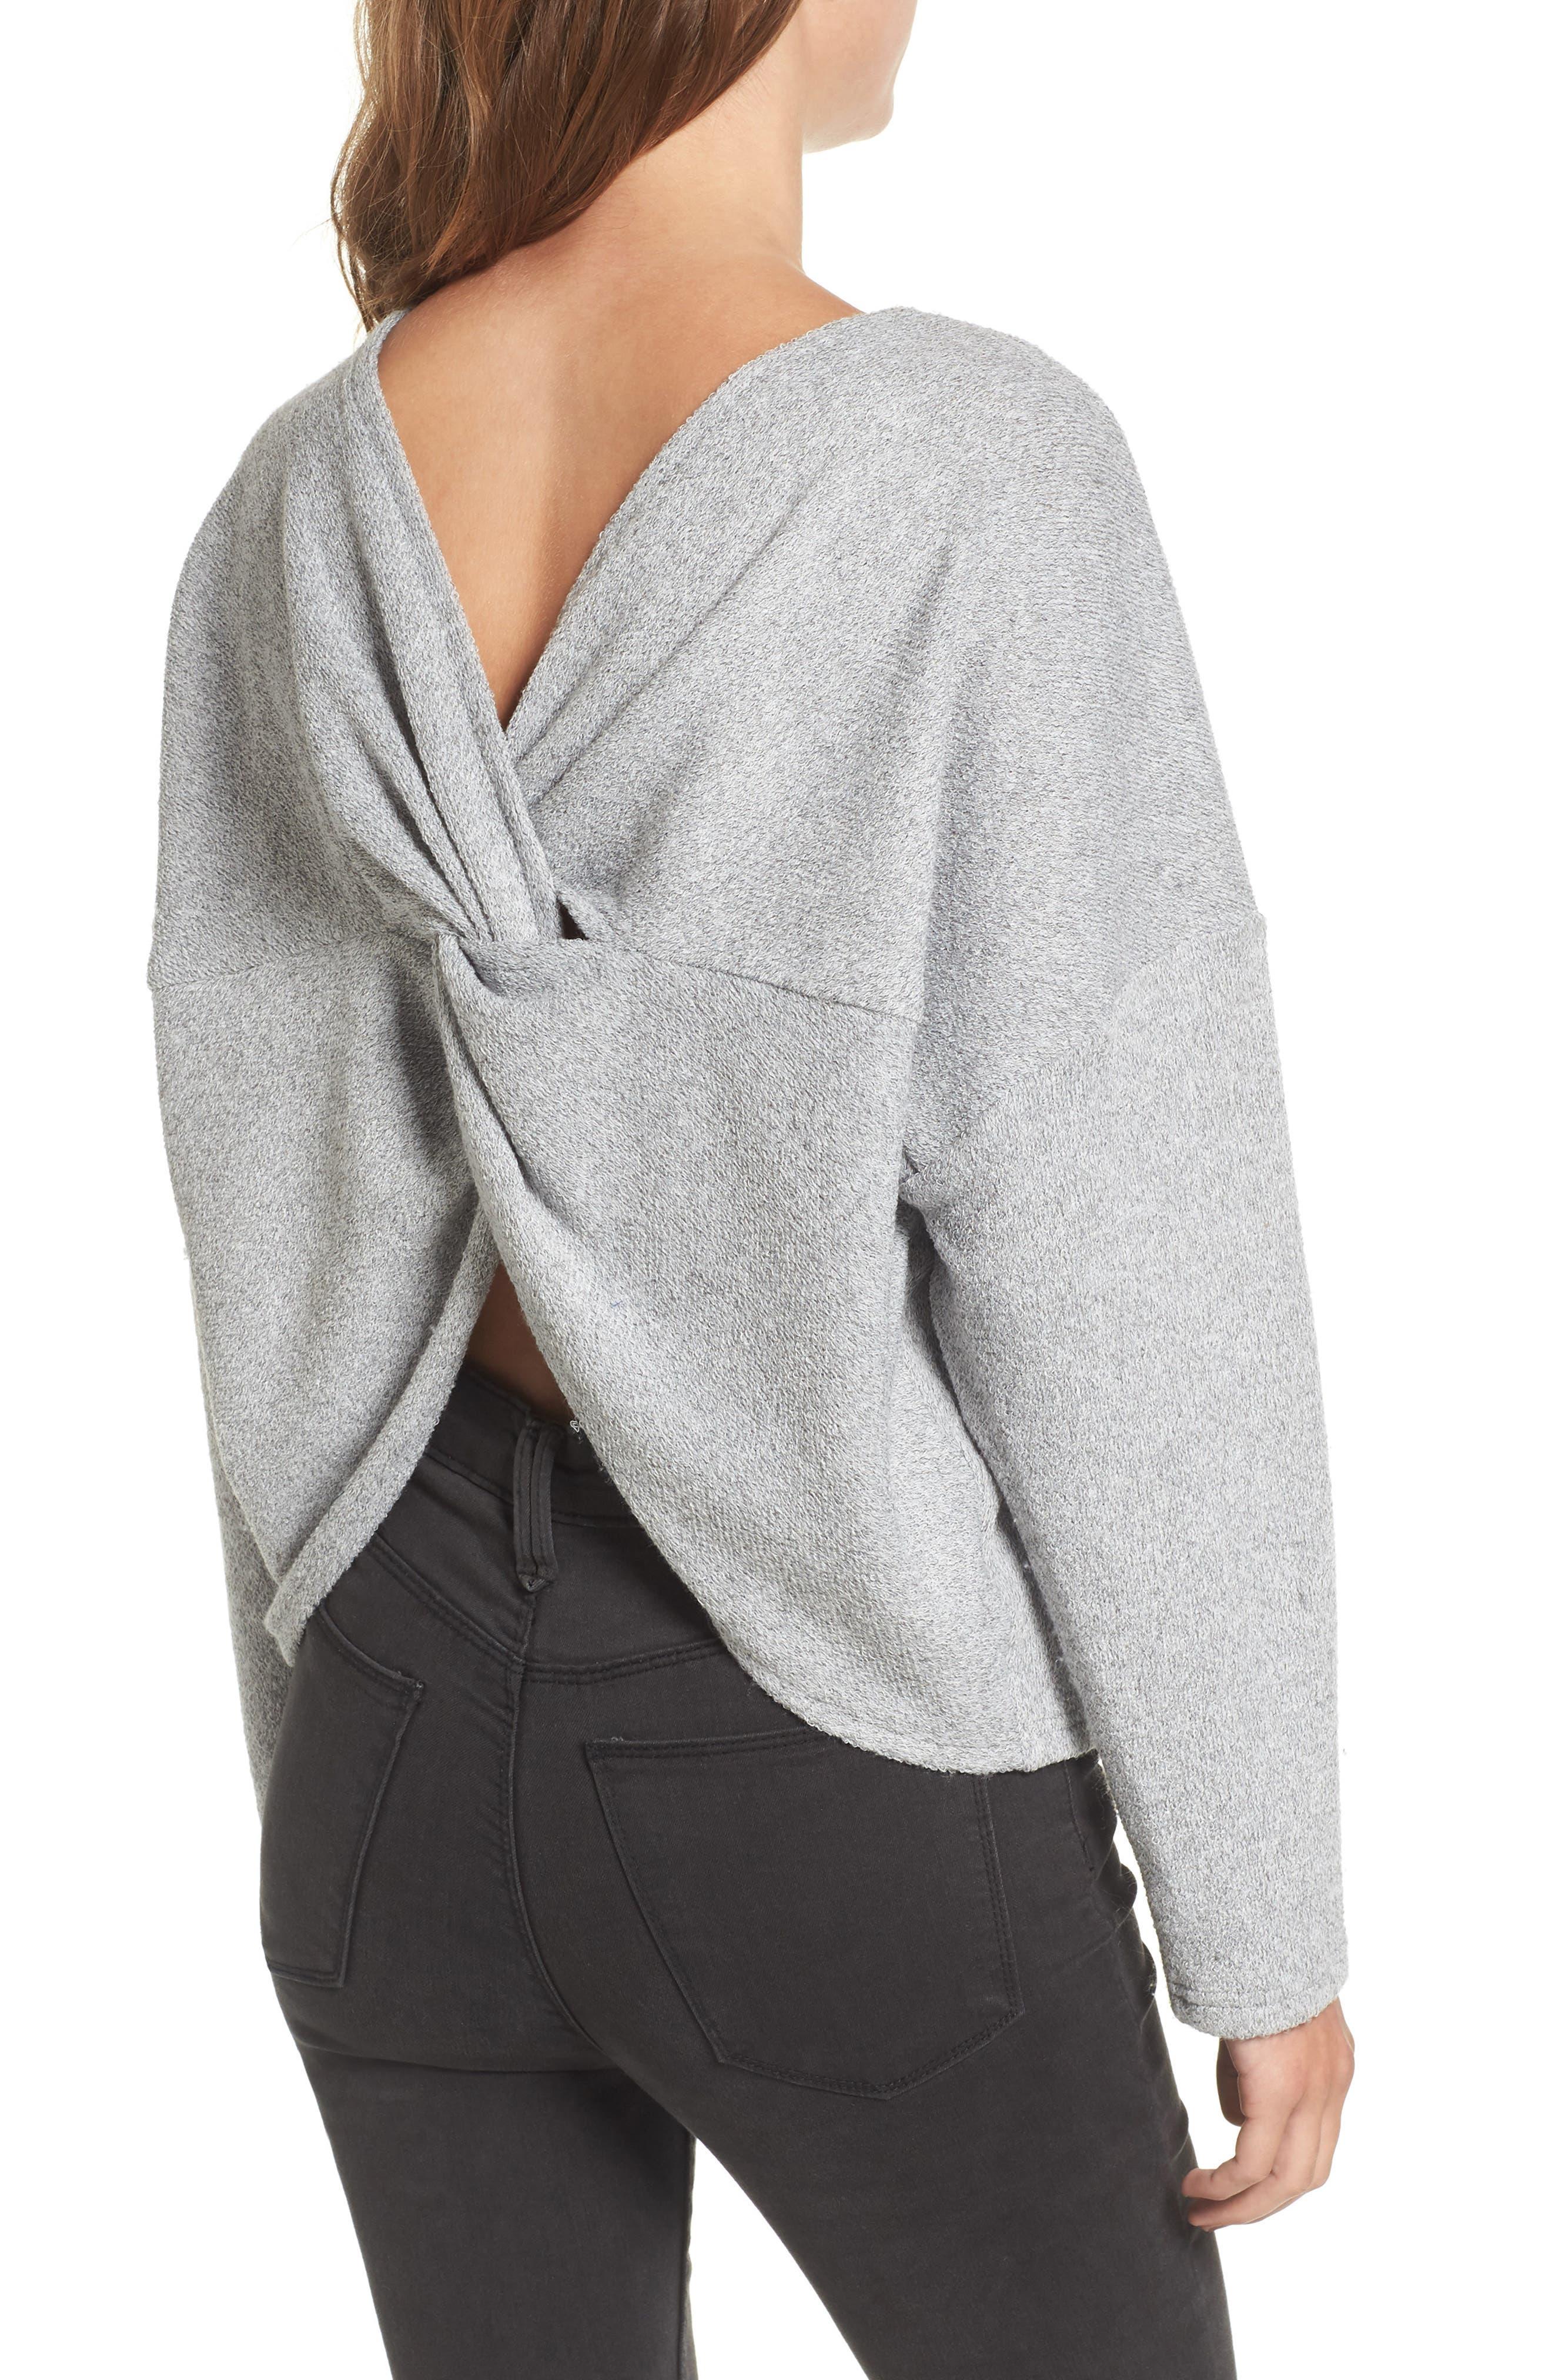 STOREE Knot Back Sweatshirt